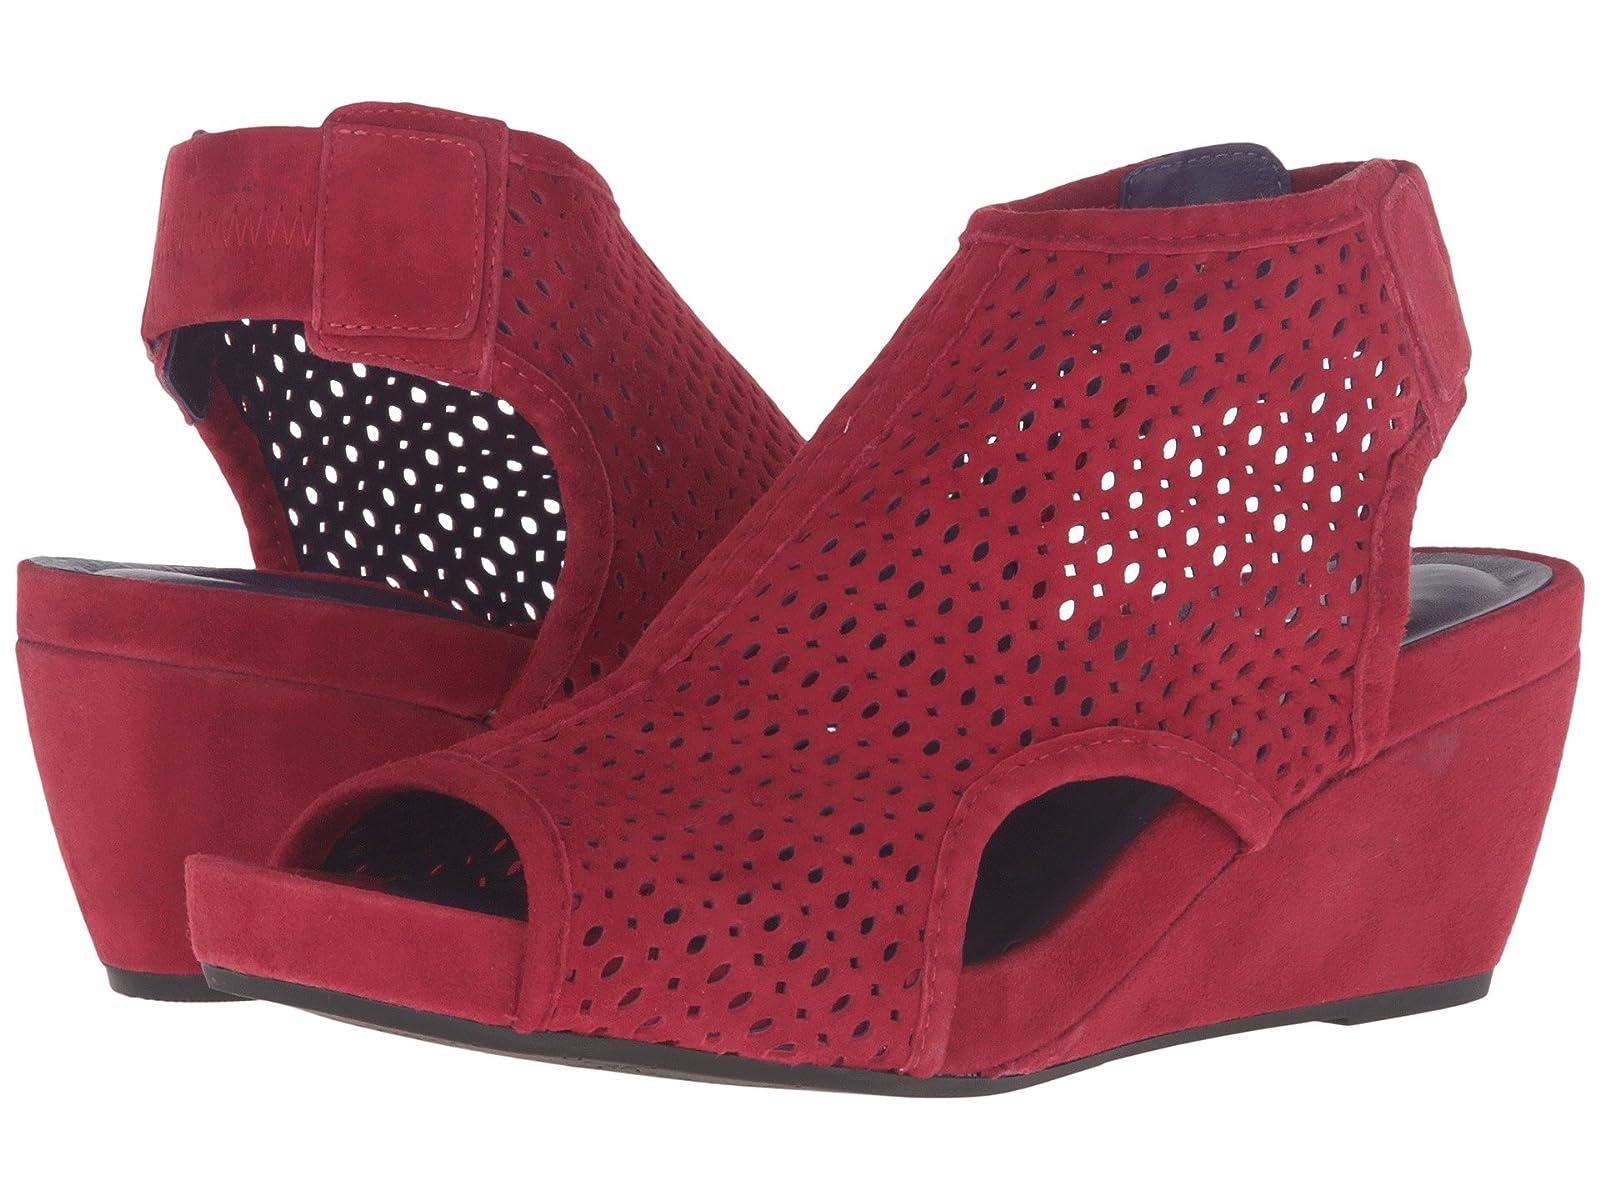 Vaneli InezCheap and distinctive eye-catching shoes